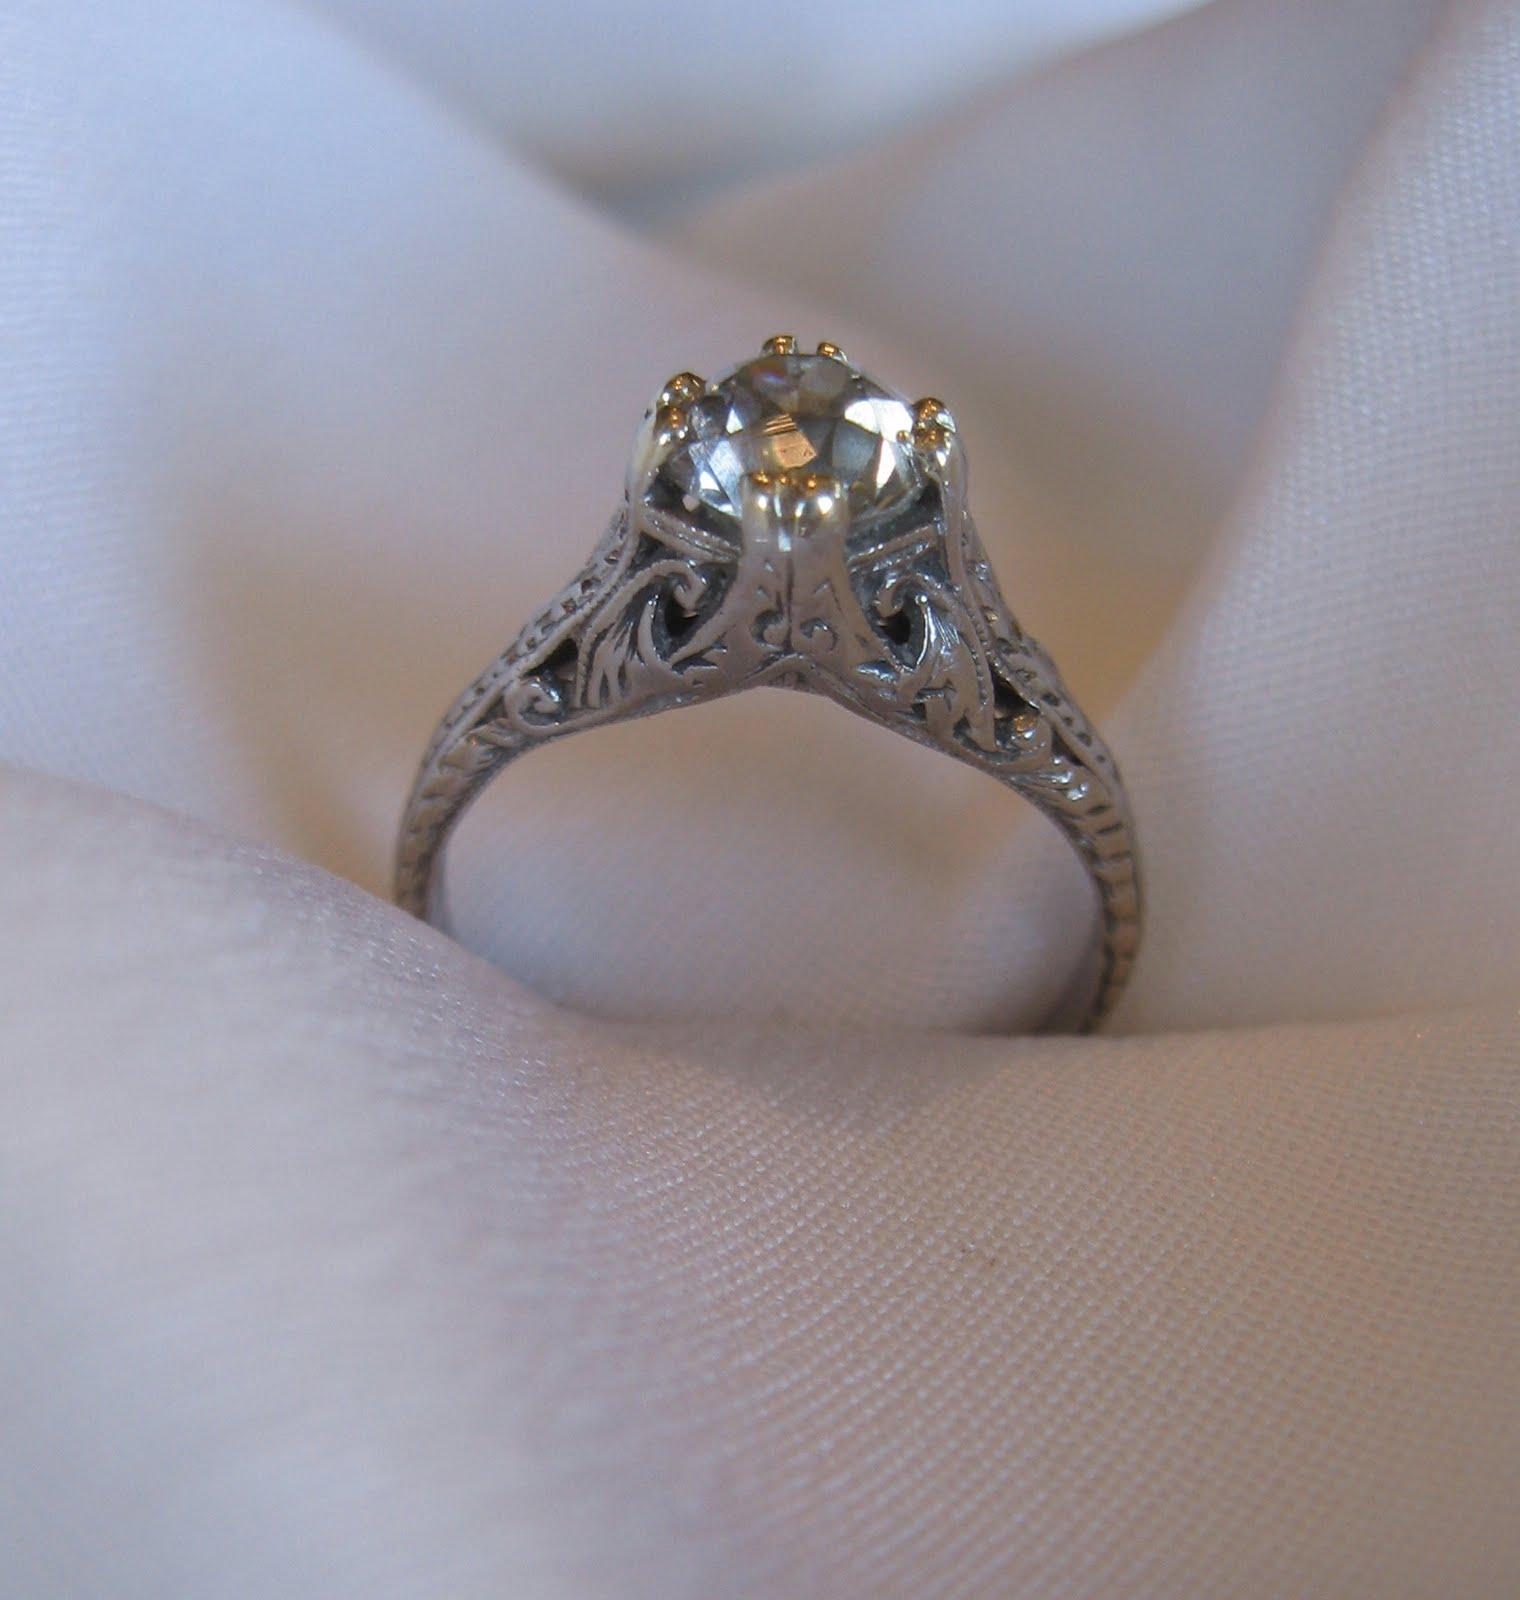 How To Make A Fake Wedding Ring Unique Wedding Ideas